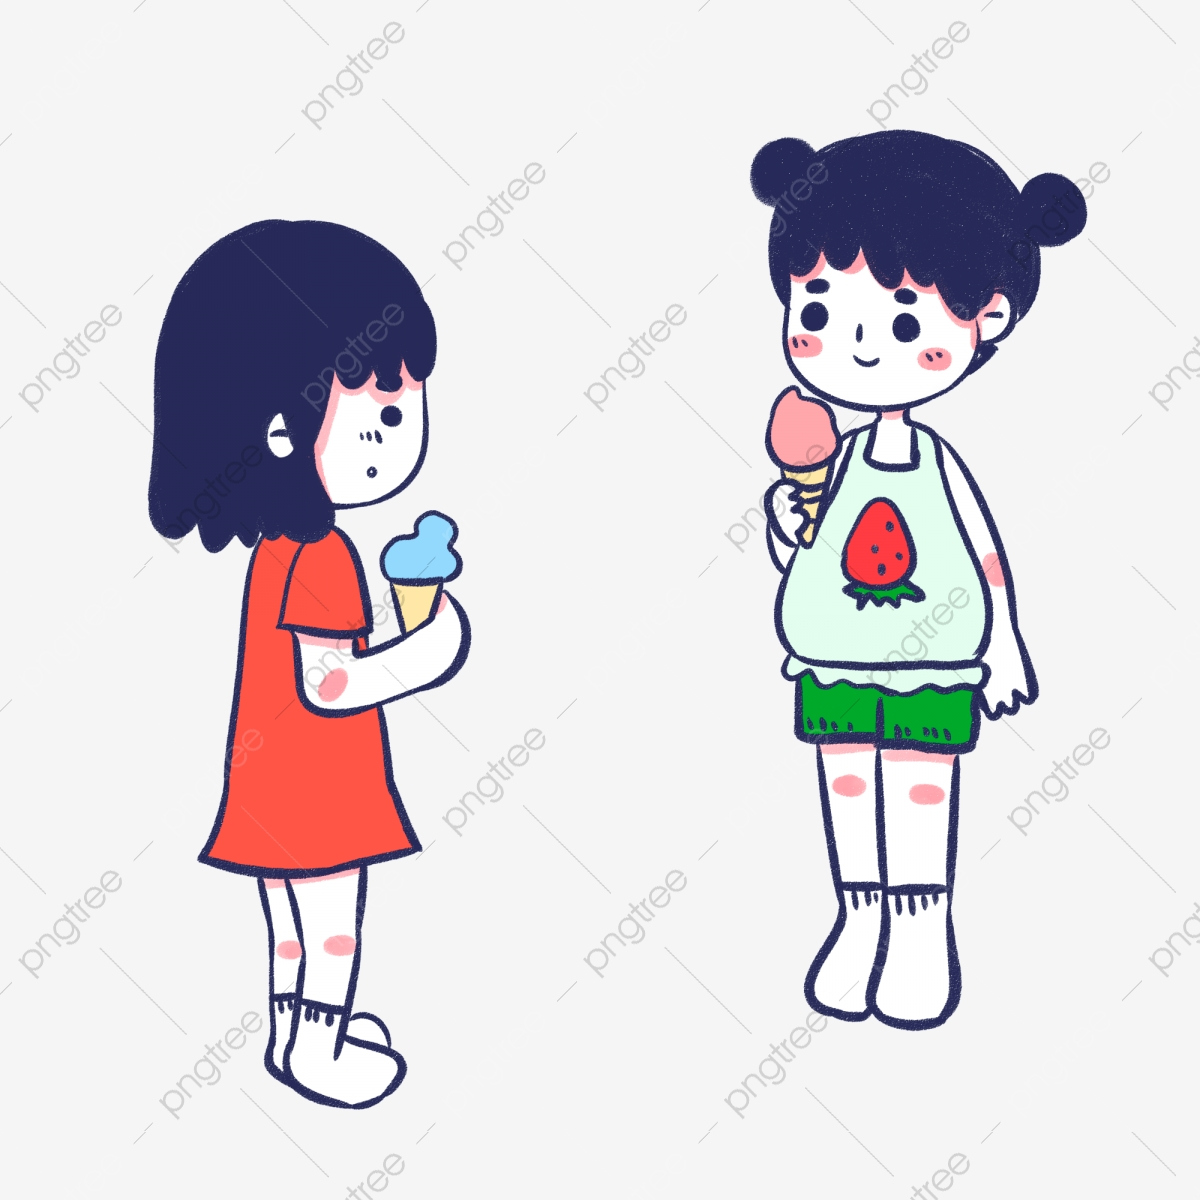 Sisters Cartoon Character Design Eating Ice Cream Hand